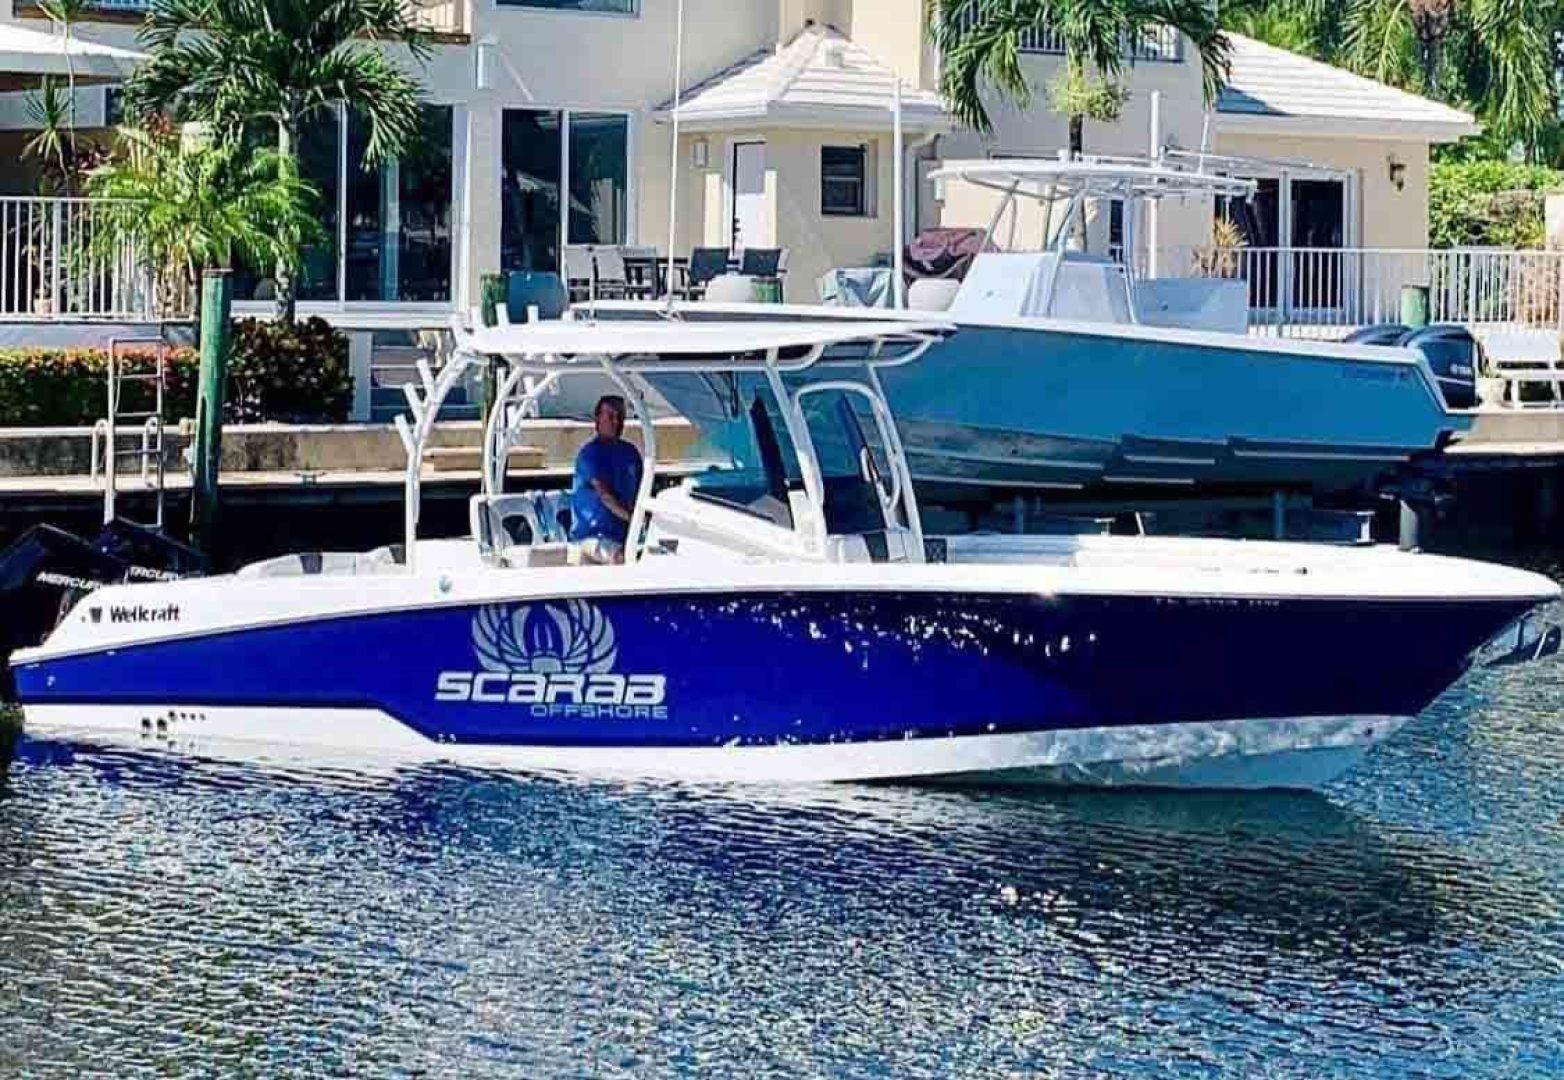 Wellcraft-Scarab 2019-Life of Riley Jupiter-Florida-United States-1475787 | Thumbnail